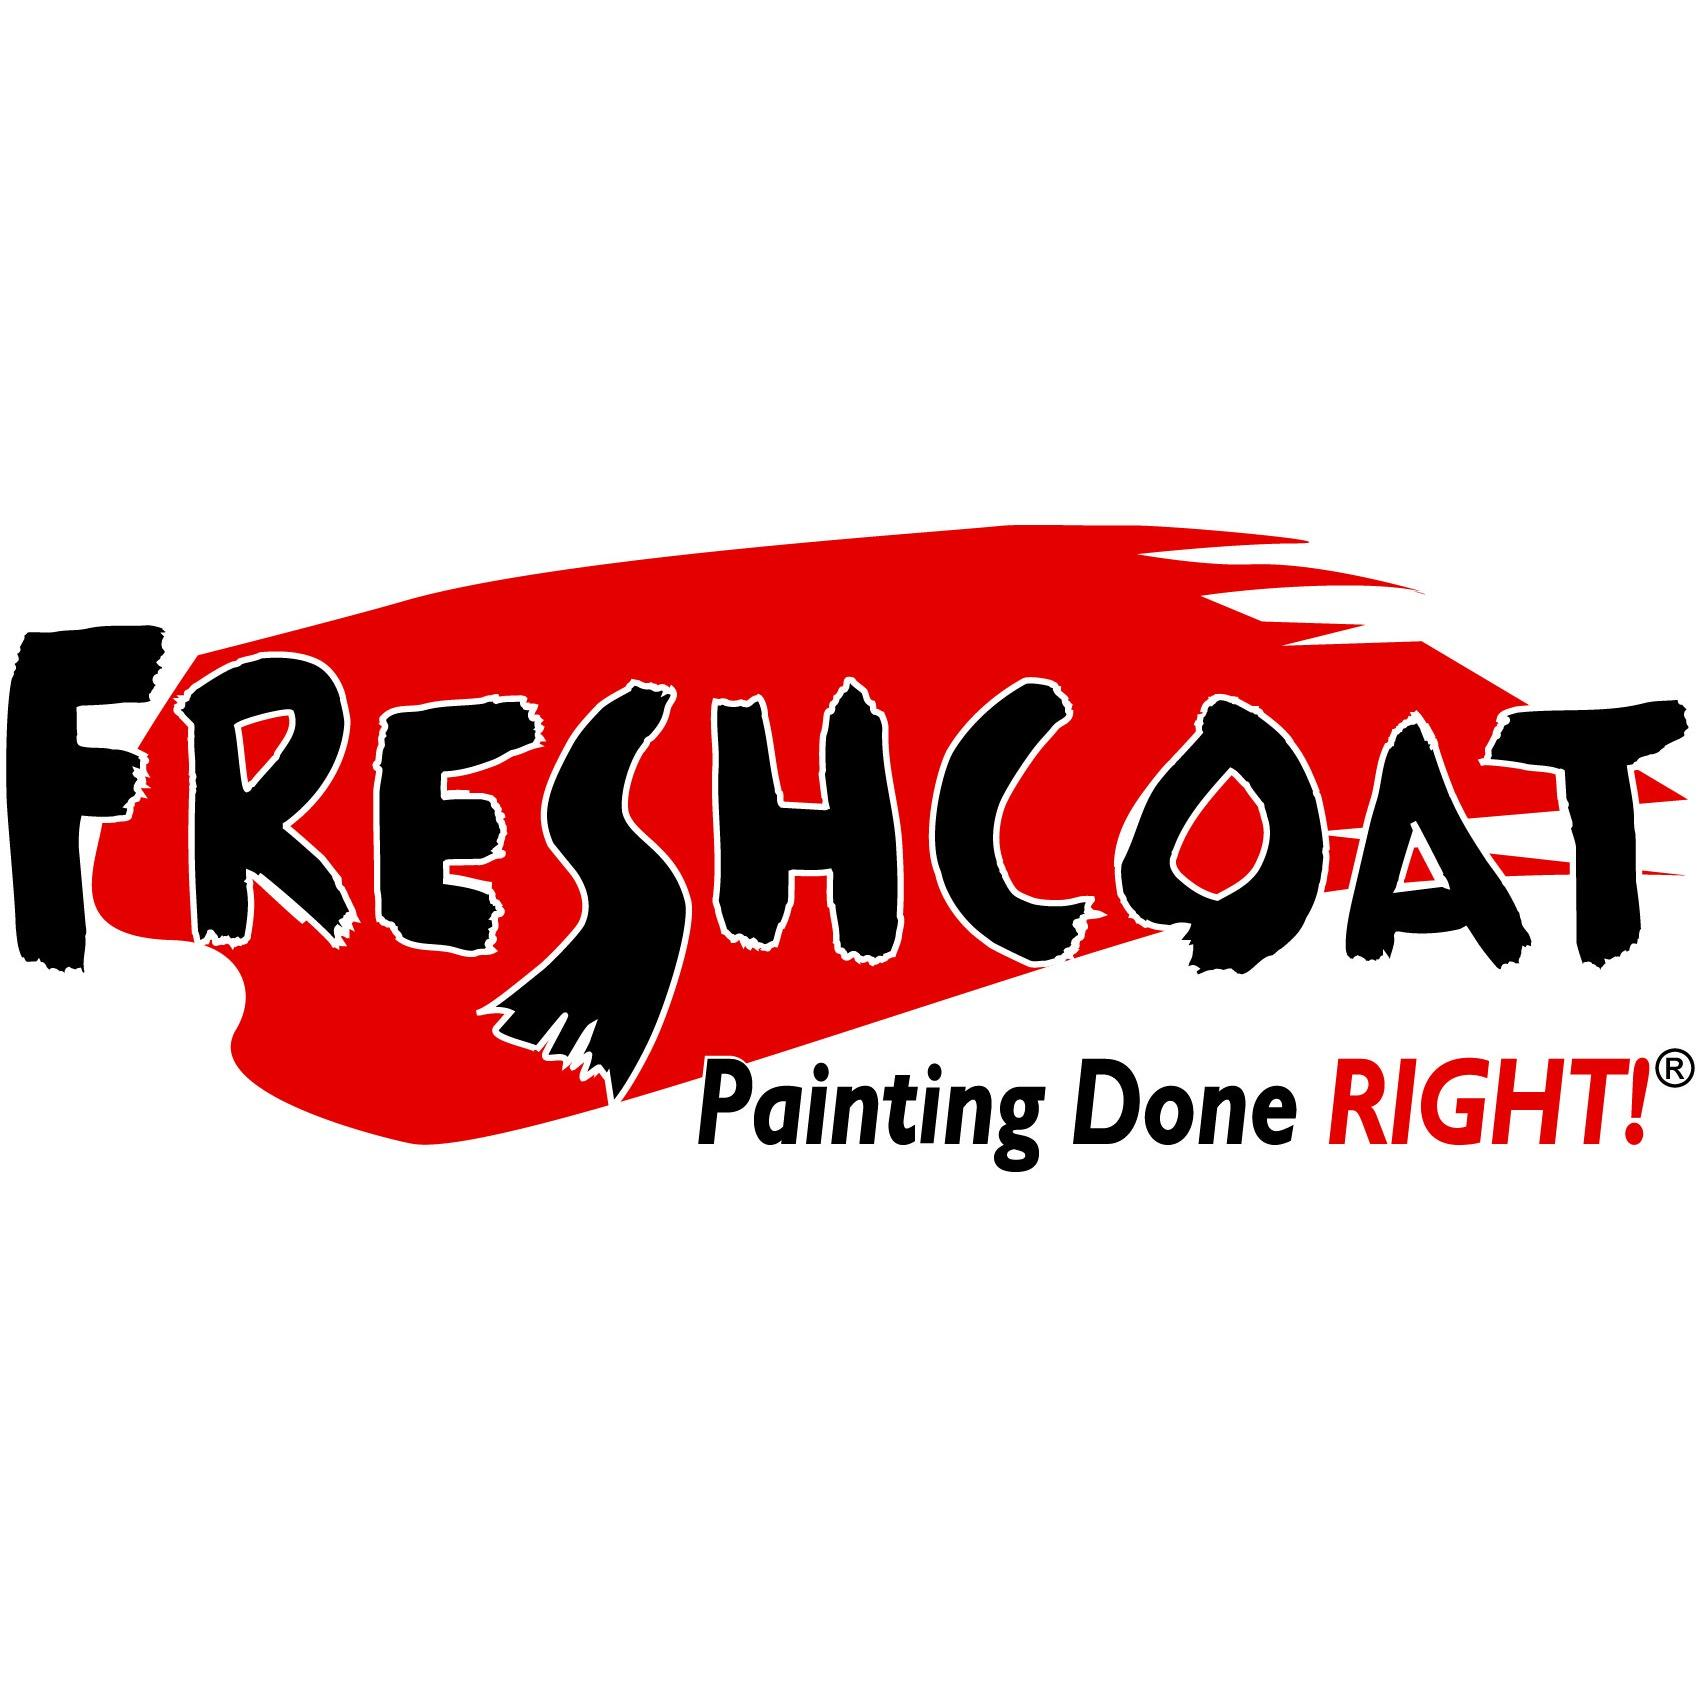 Painter in TX Cedar Park 78613 Fresh Coat North Austin 1841 S Lakeline Blvd STE 101, #204  (512)796-6371